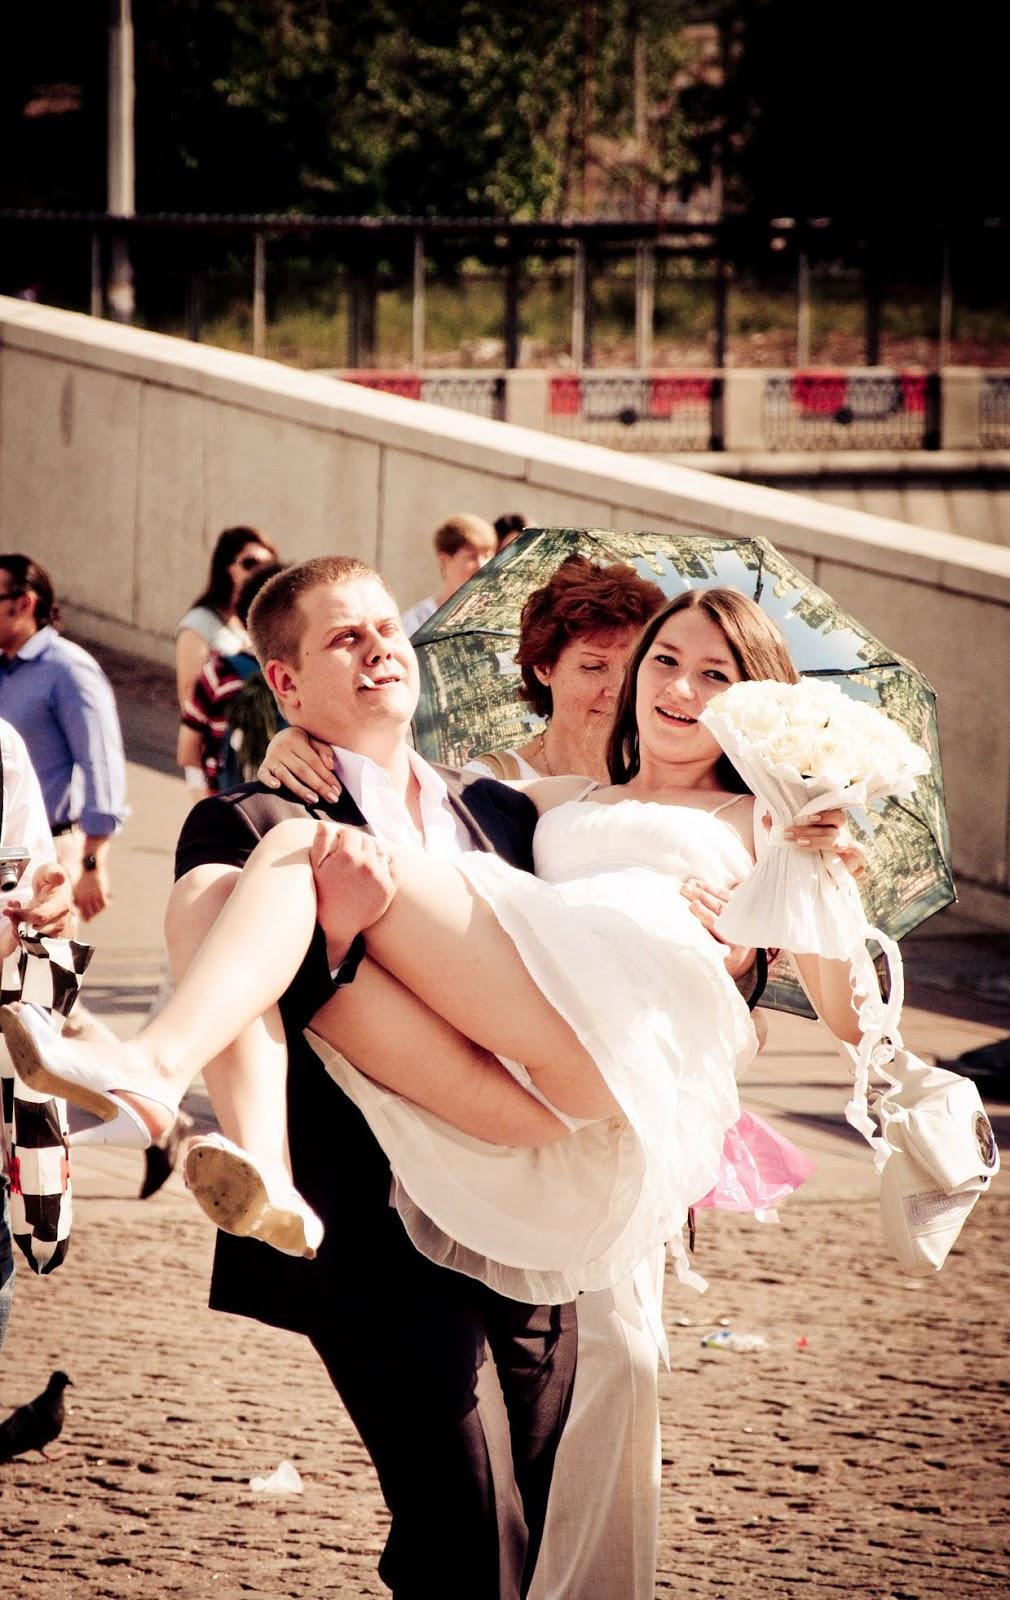 White Panty Happy Bride | Amateur Upskirt: amateur-upskirt.blogspot.com/2013/04/white-panty-happy-bride.html